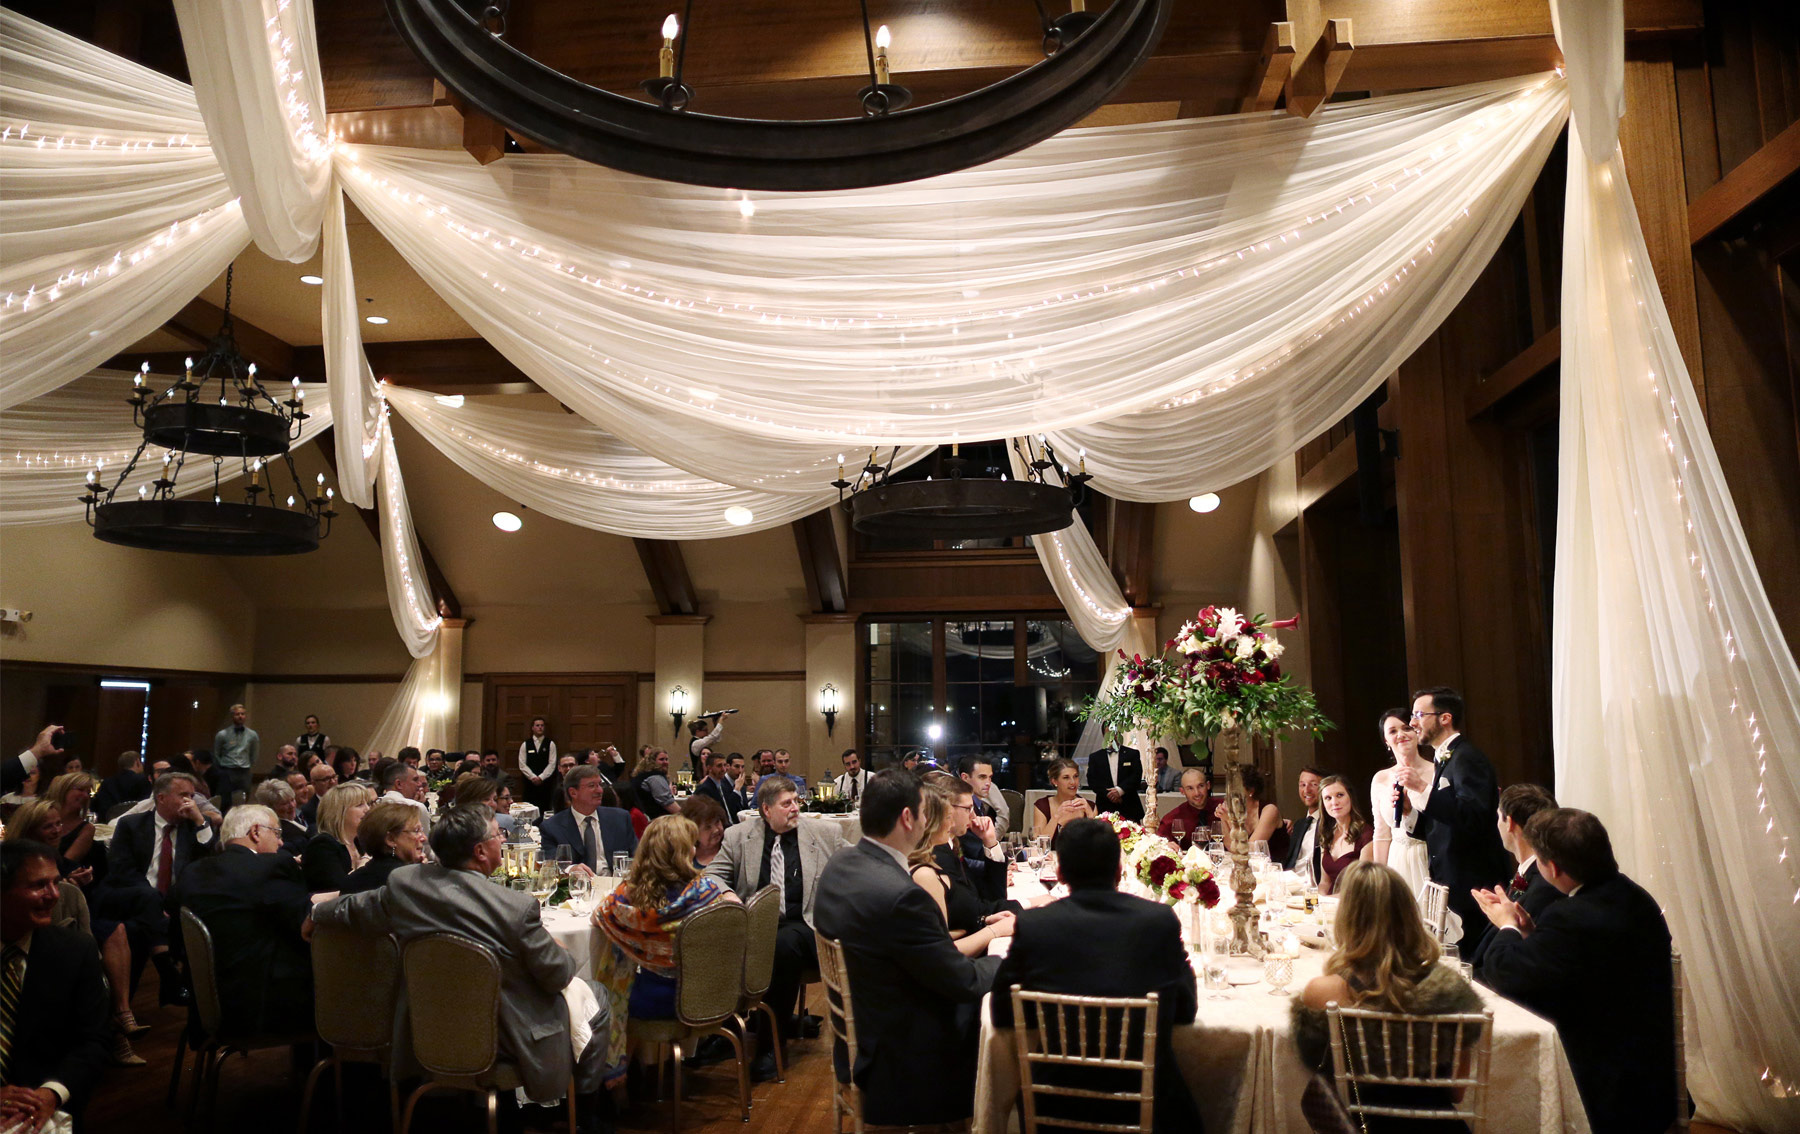 16-Minneapolis-Minnesota-Wedding-Photography-by-Vick-Photography-Reception-Interlachen-Country-Club-Sarah-and-Patrick.jpg